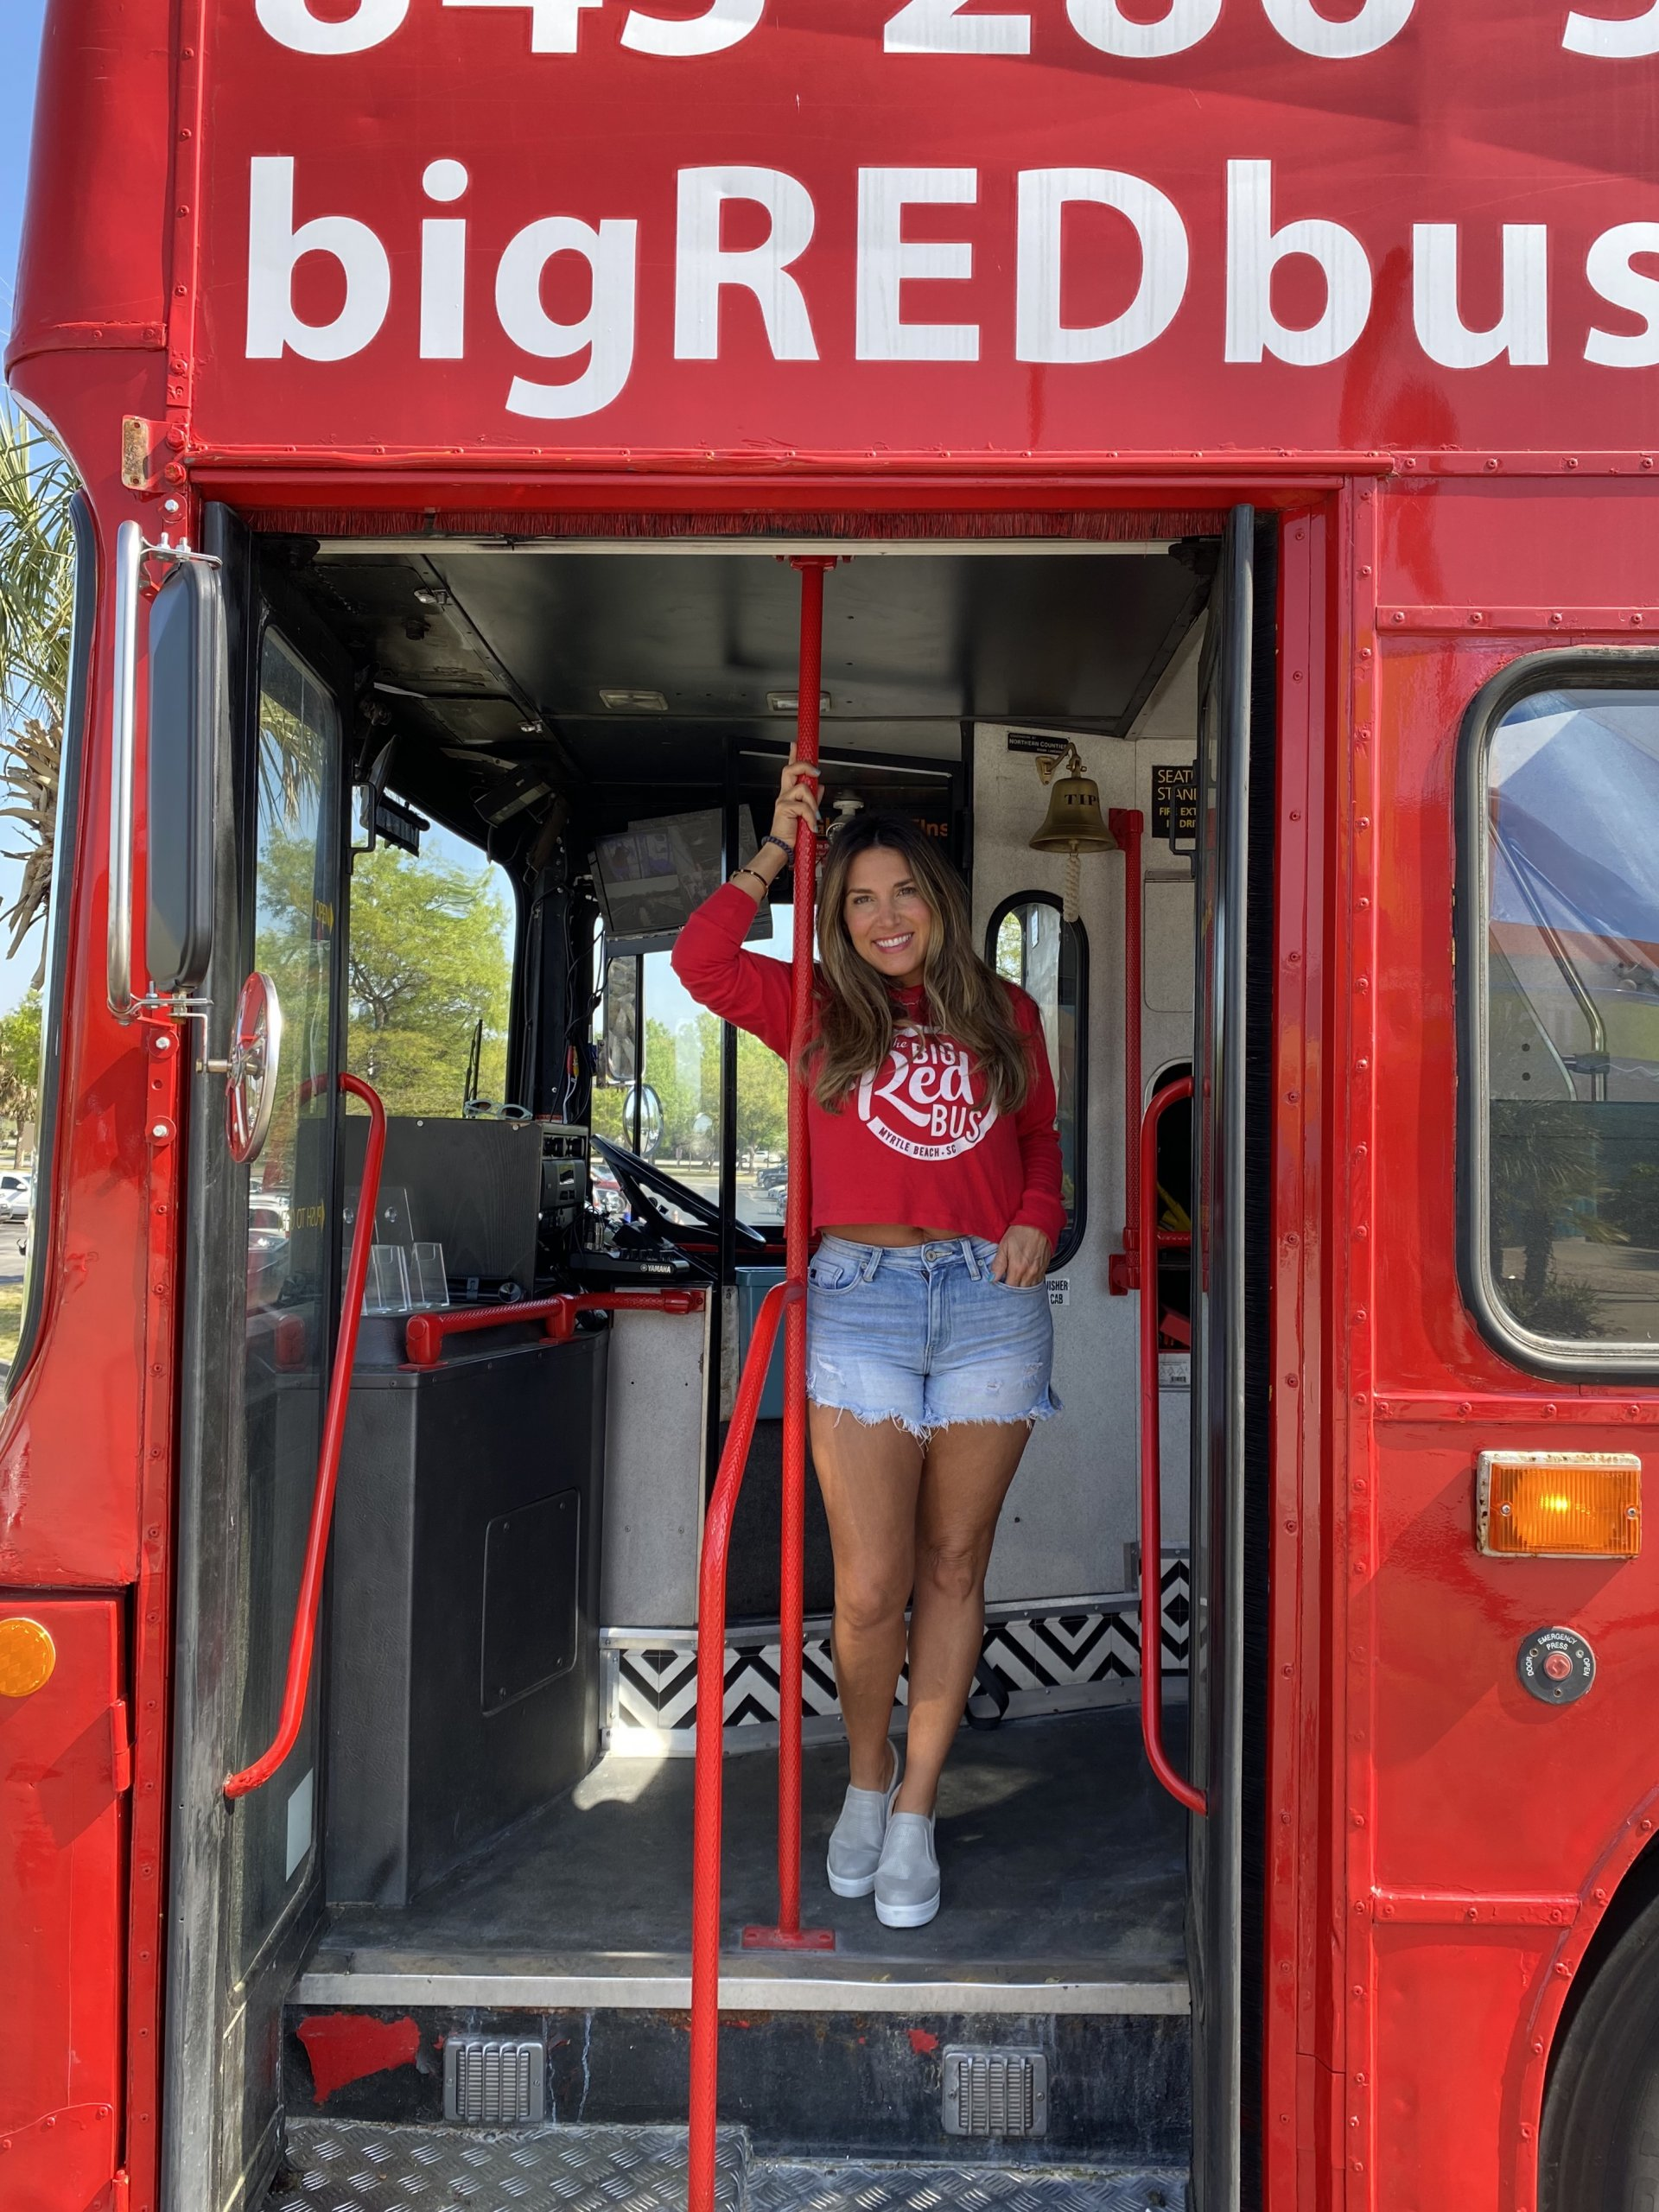 Big Red Bus - Myrtle Beach Tours